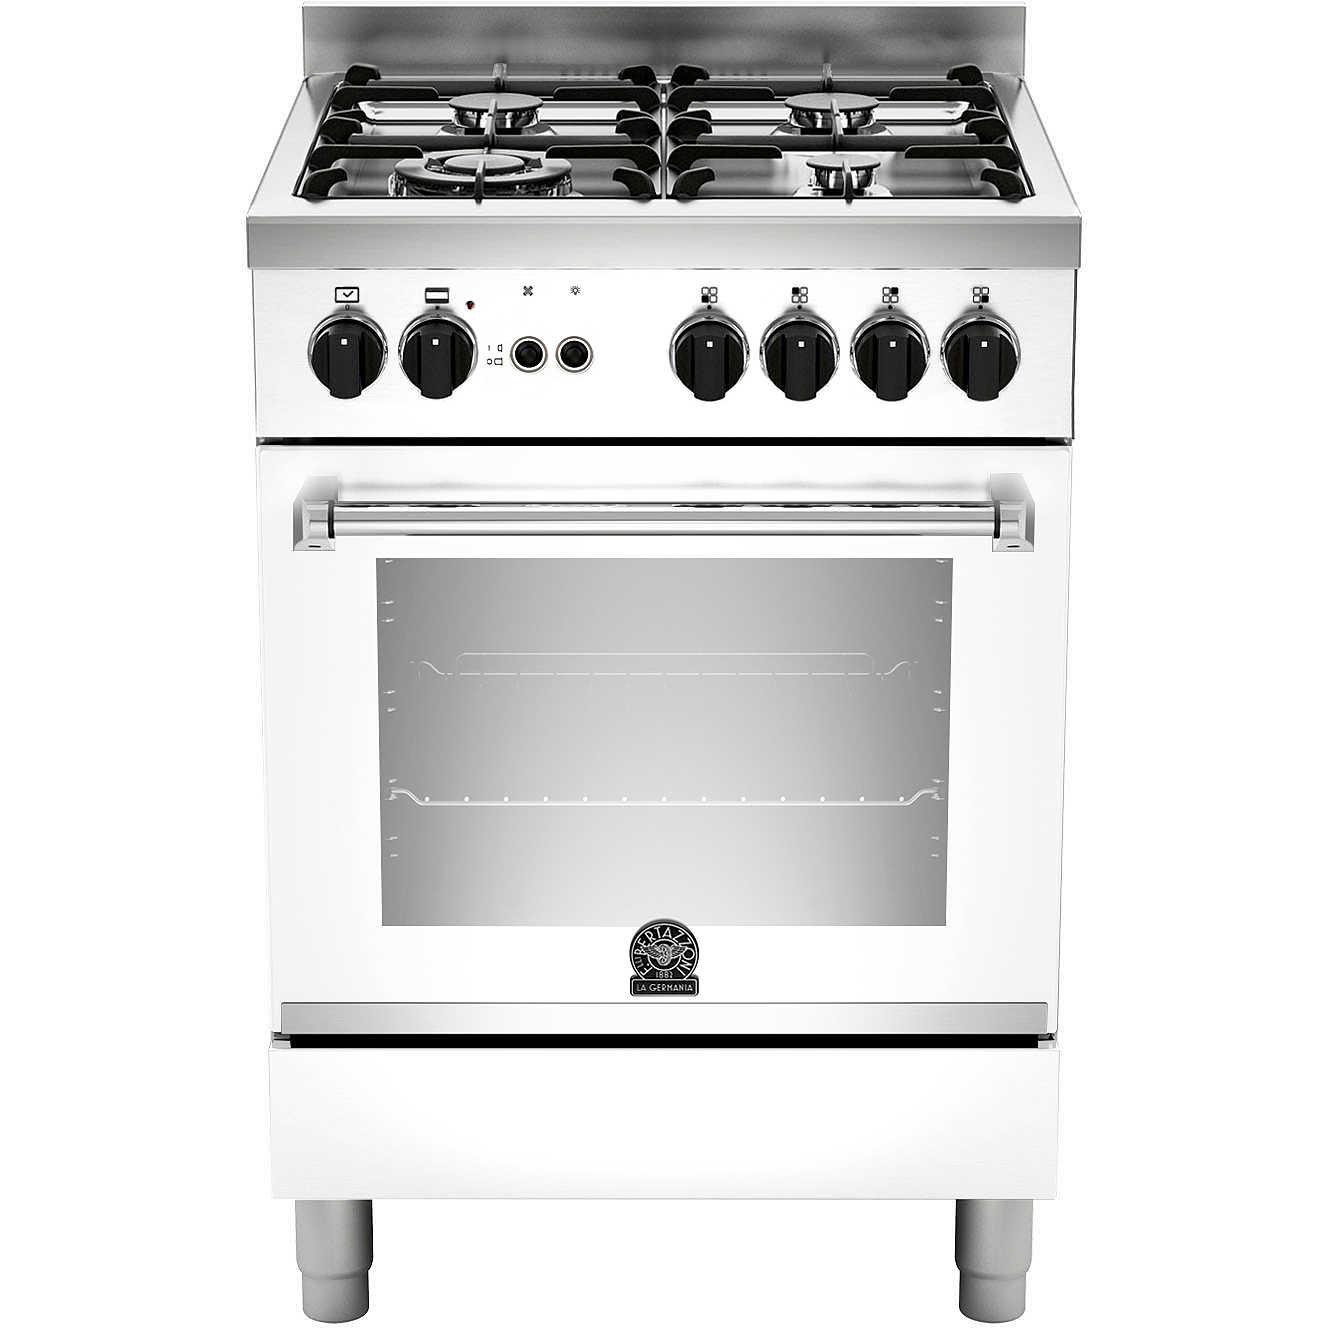 La germania amn604gevswc cucina 60x60 4 fuochi a gas forno gas ventilato con grill elettrico 56 - Cucina con forno a gas ventilato ...